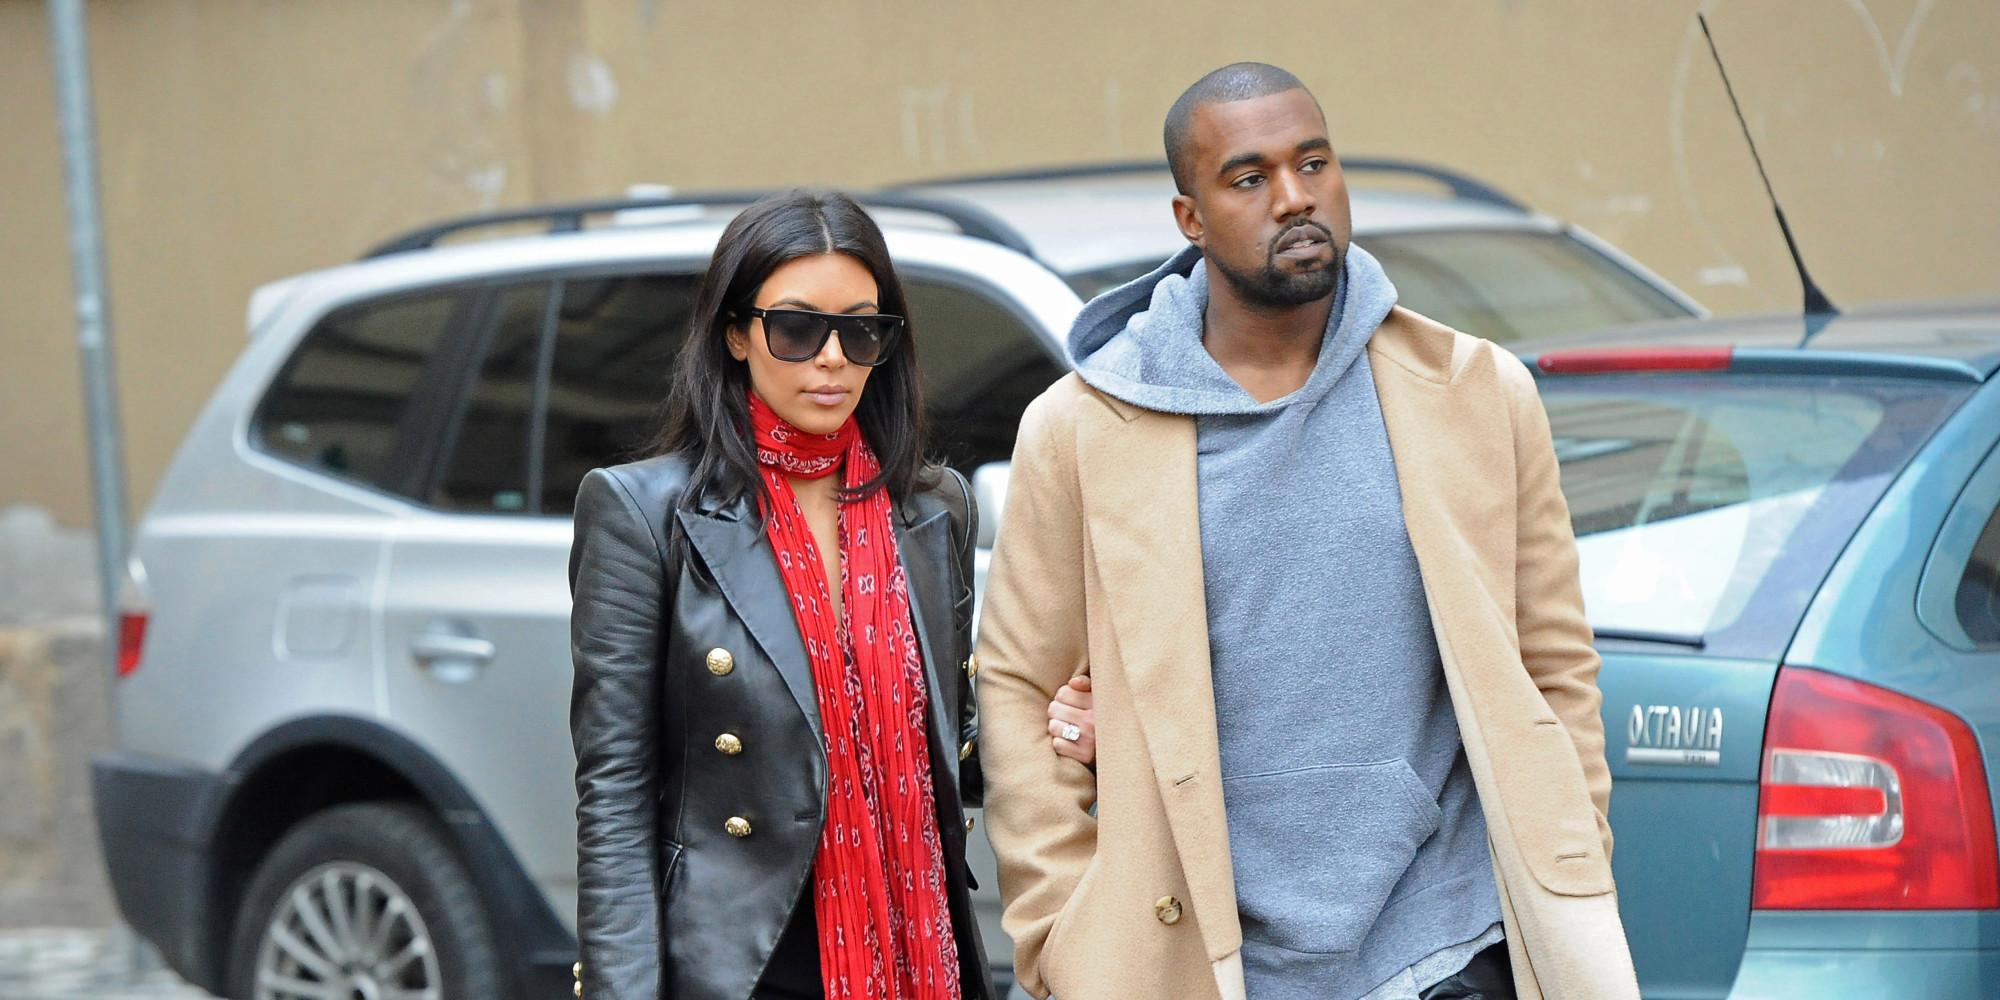 Kim Kardashian Wedding Gift: Kanye West Gave Kim Kardashian A Nude Portrait Of Herself